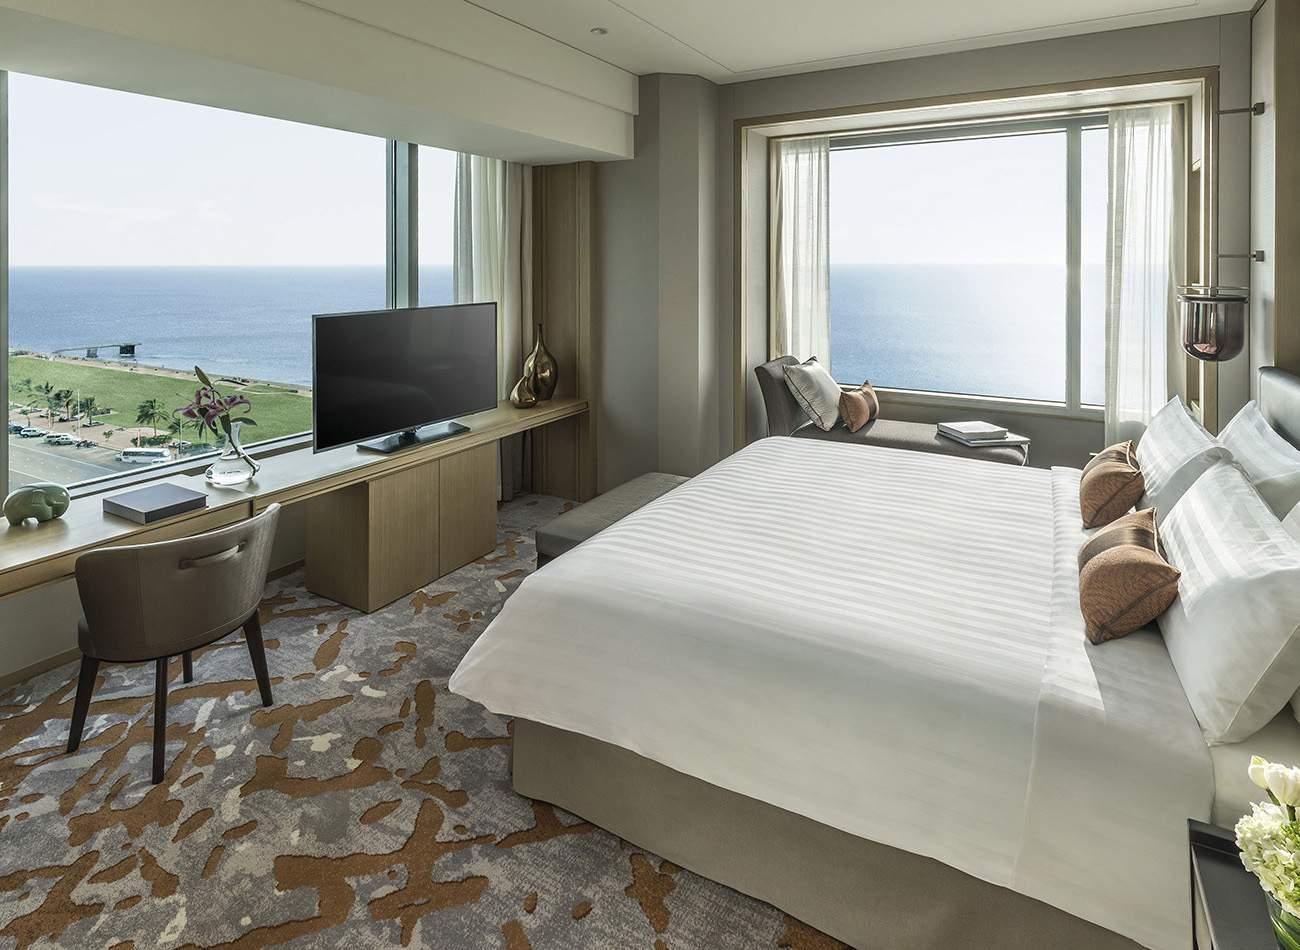 Shangri%20La%20Hotel%20Colombo%20Two%20Bedroom%20Apartment%20-%20Master%20Bedroom.jpg